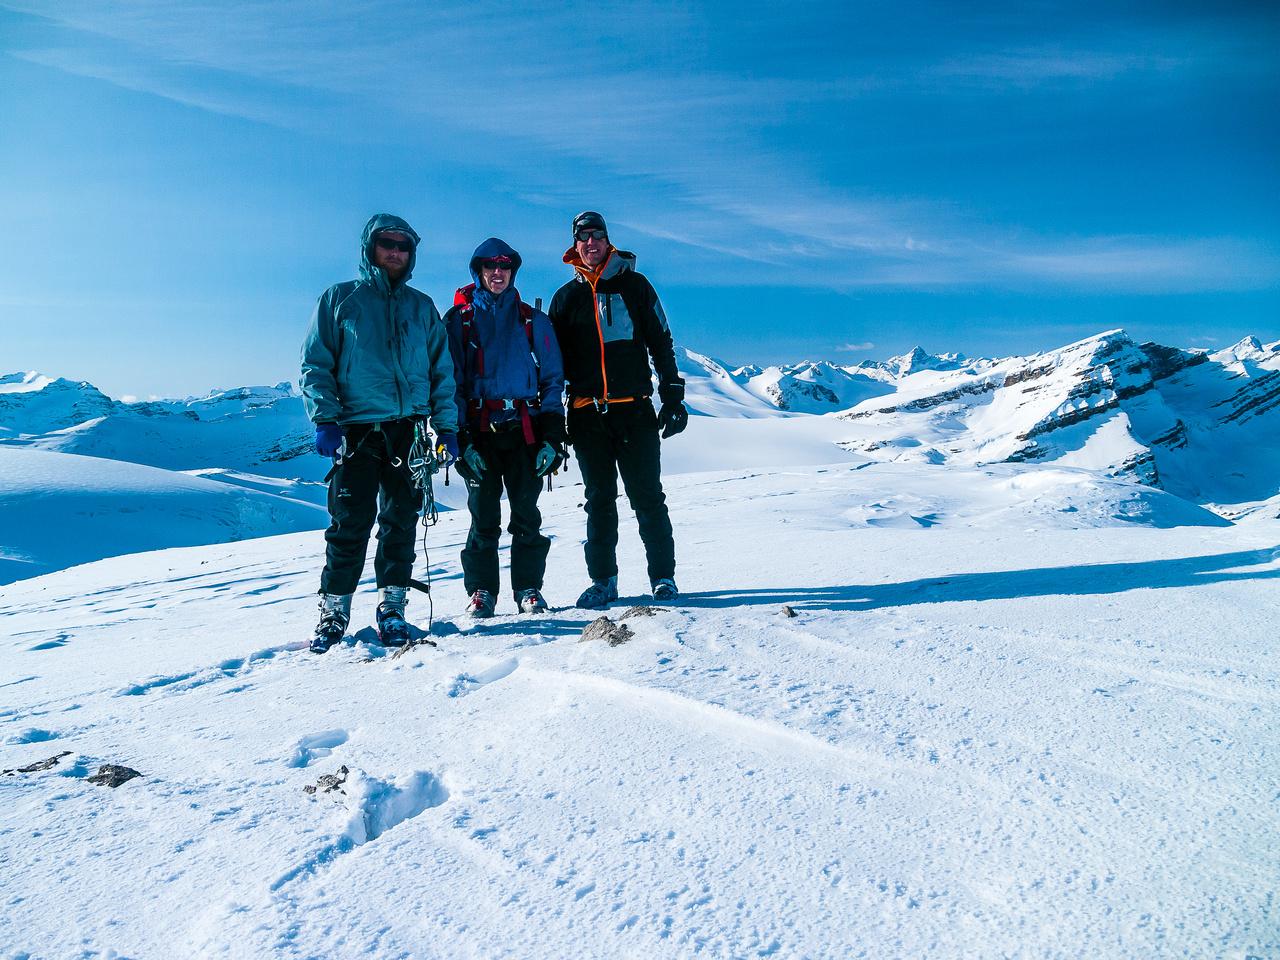 Ben, TJ and Vern on the summit of Vulture Peak.